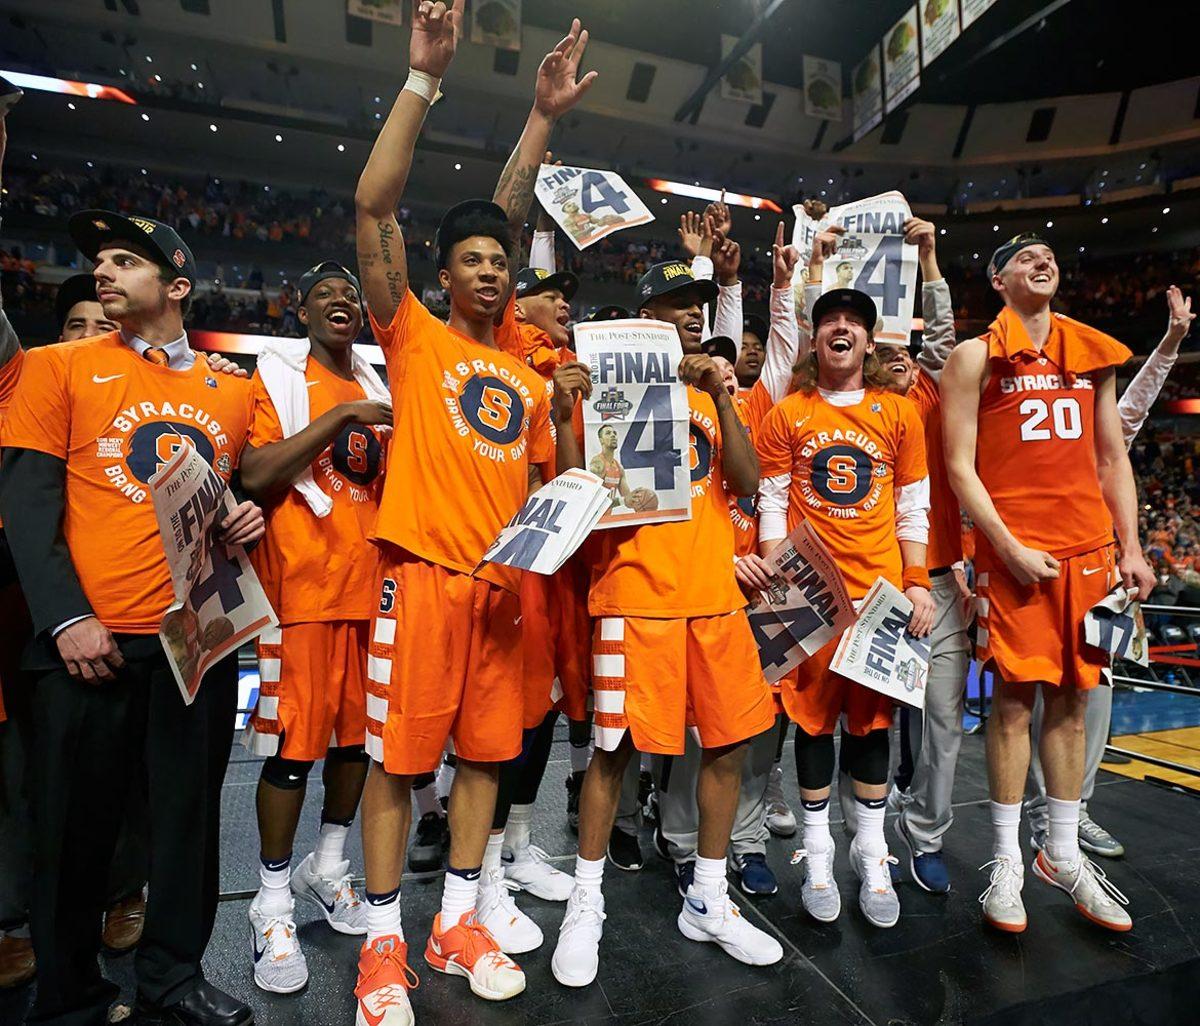 2016-0327-Syracuse-makes-Final-Four-SI-299_TK1_1781.jpg